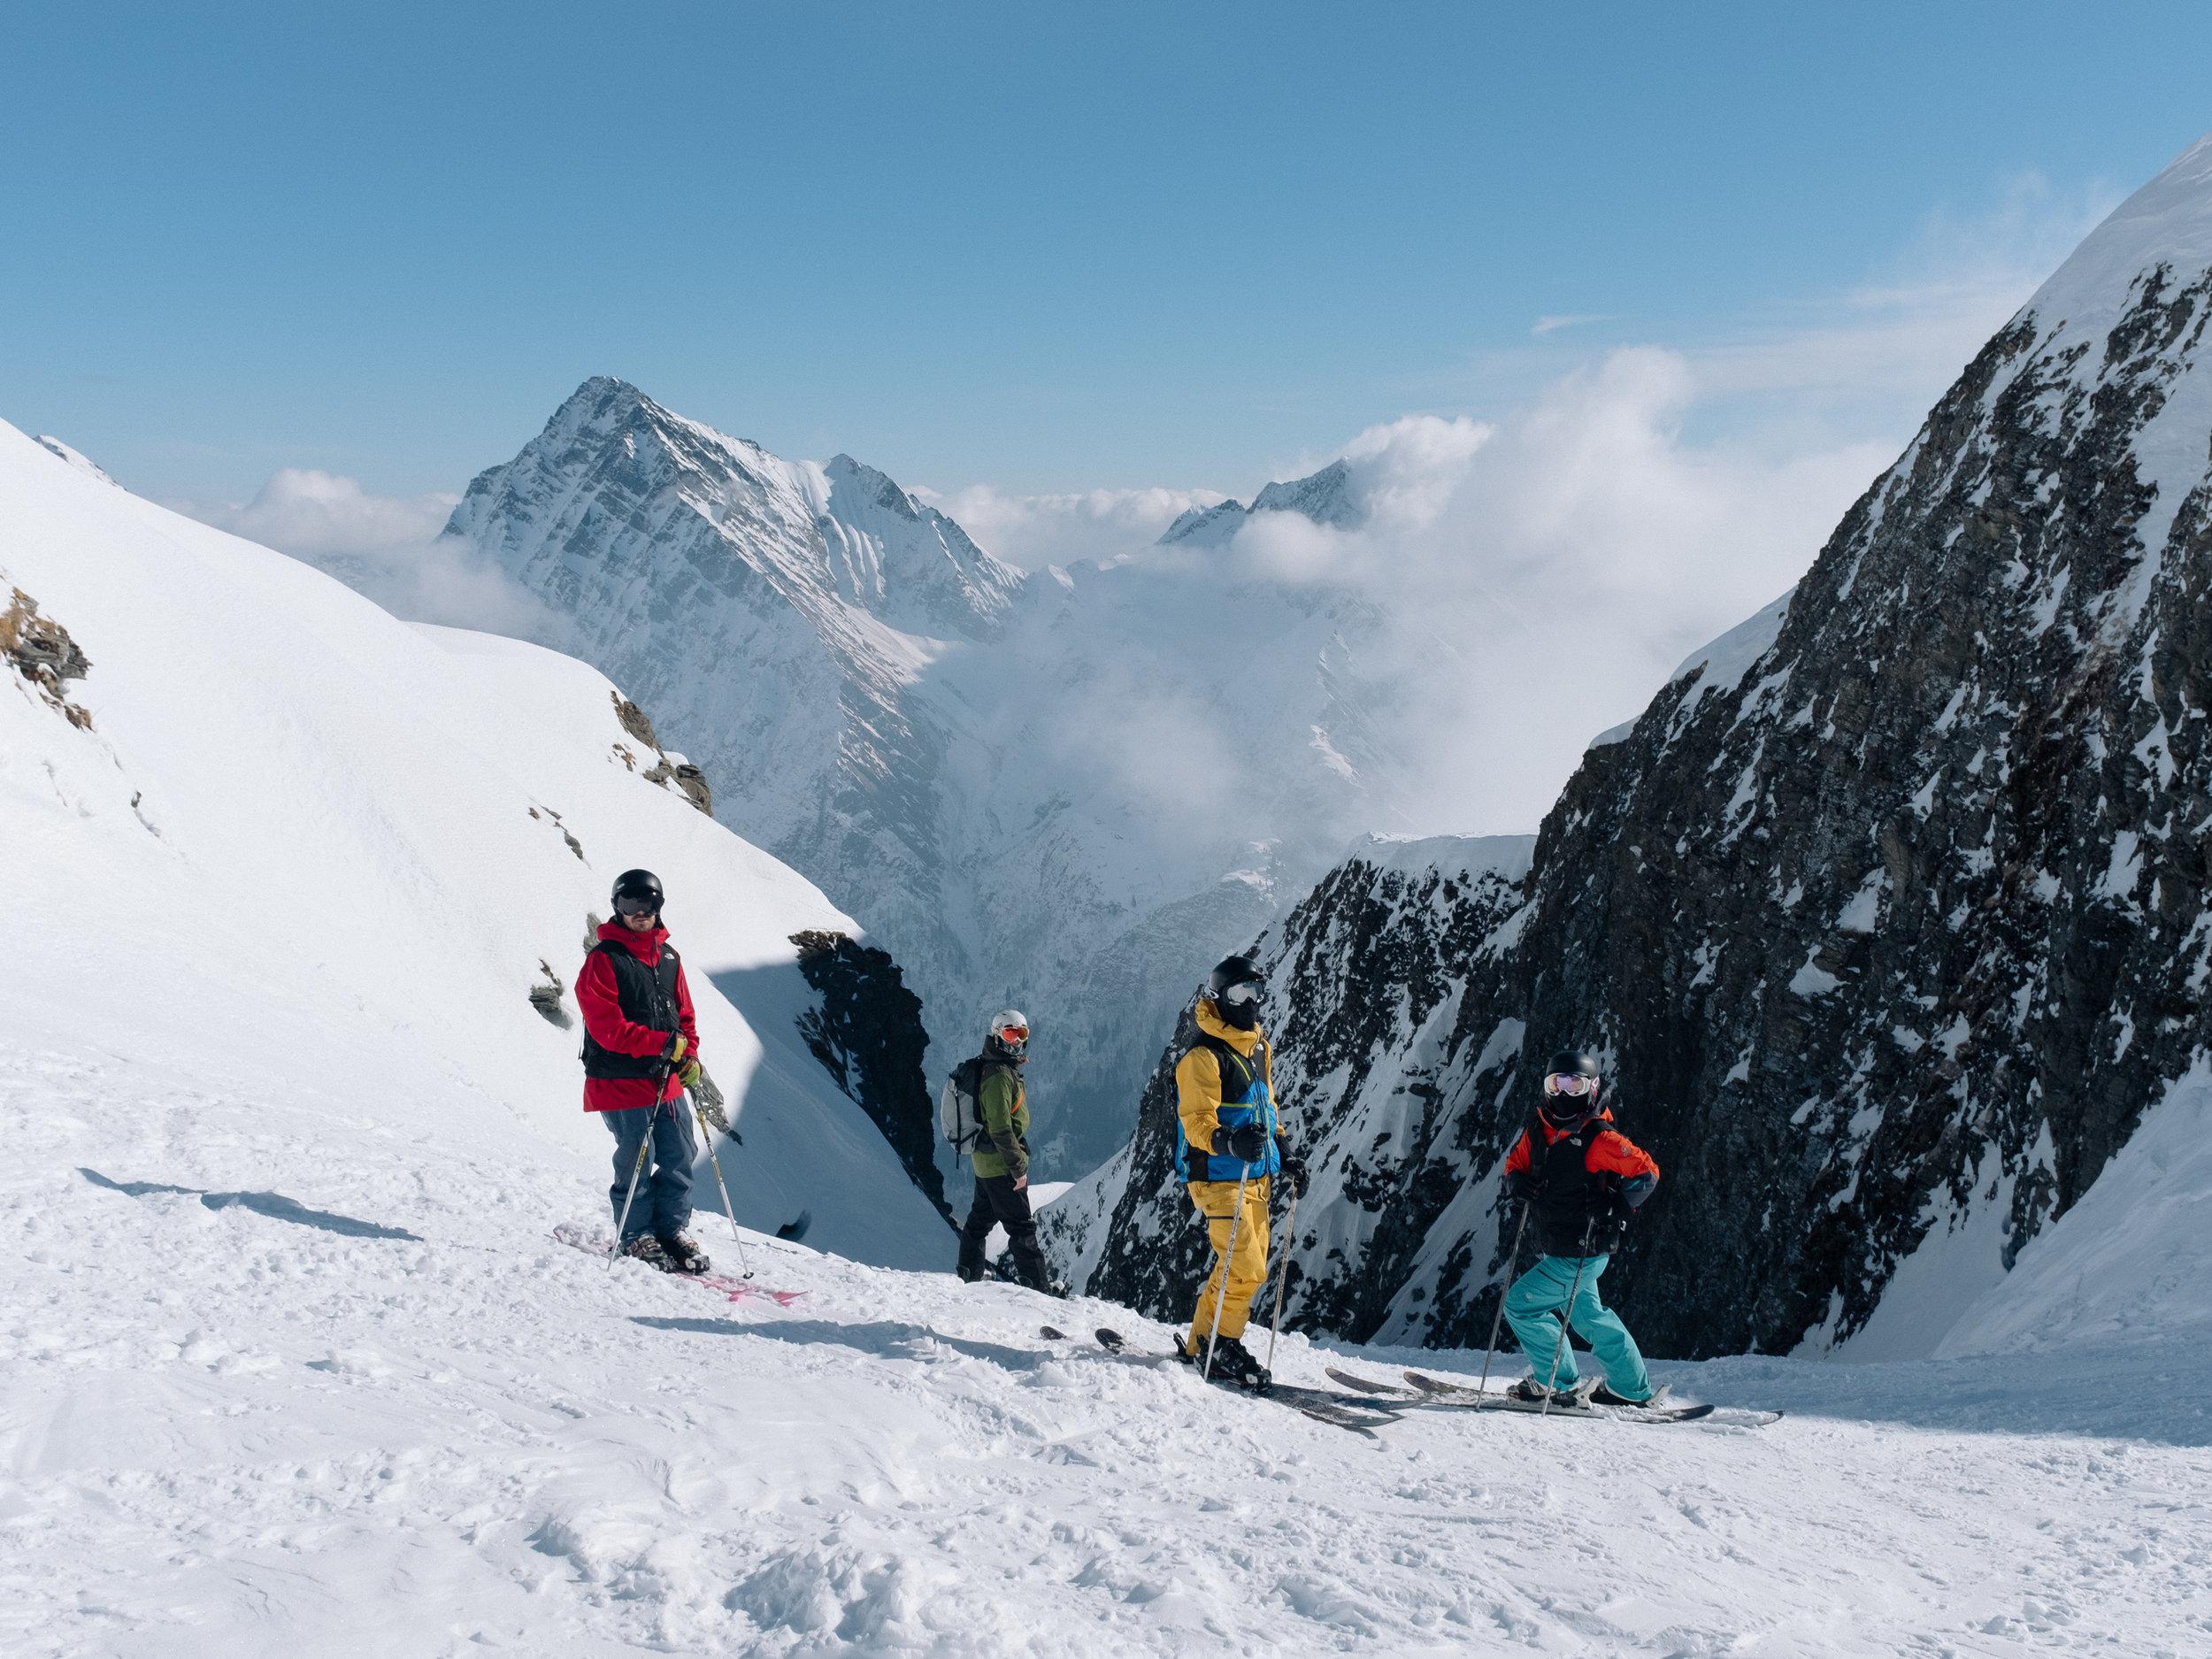 BenReadPhotography_Skiing_Alagna-26.jpg